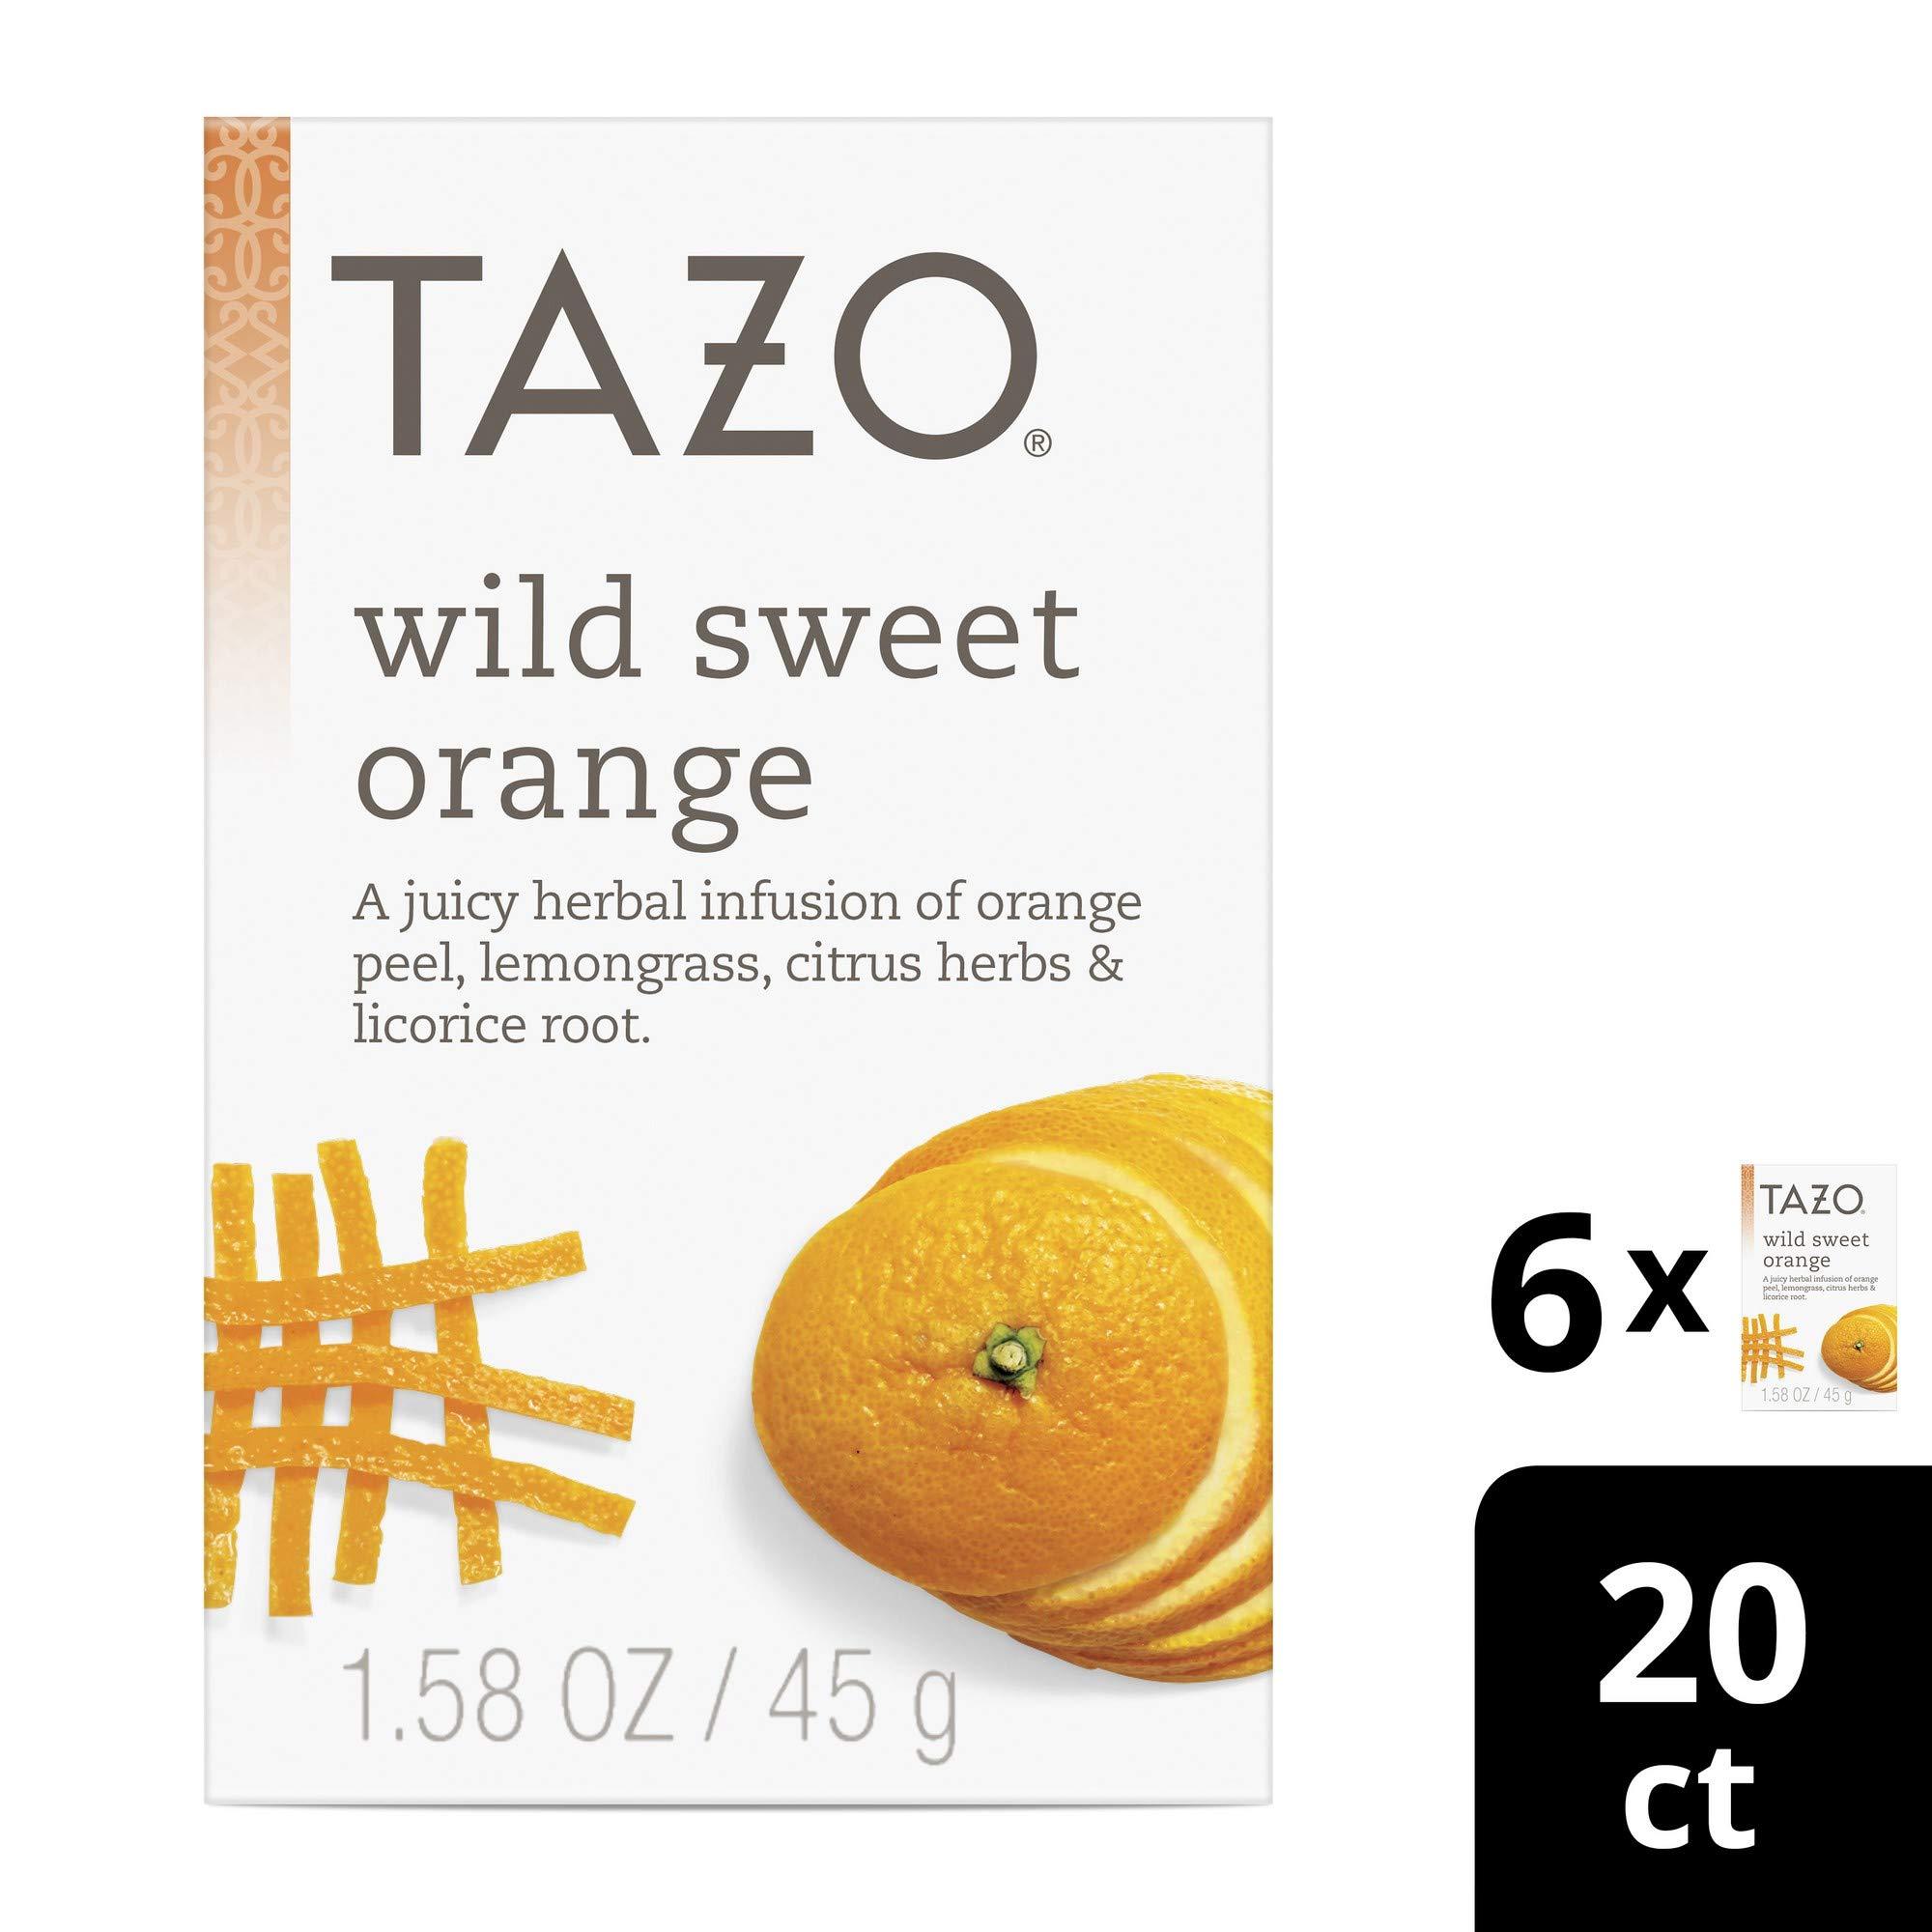 Tazo Wild Sweet Orange Herbal Tea Filterbags 20 ct, Pack of 6 by Tazo